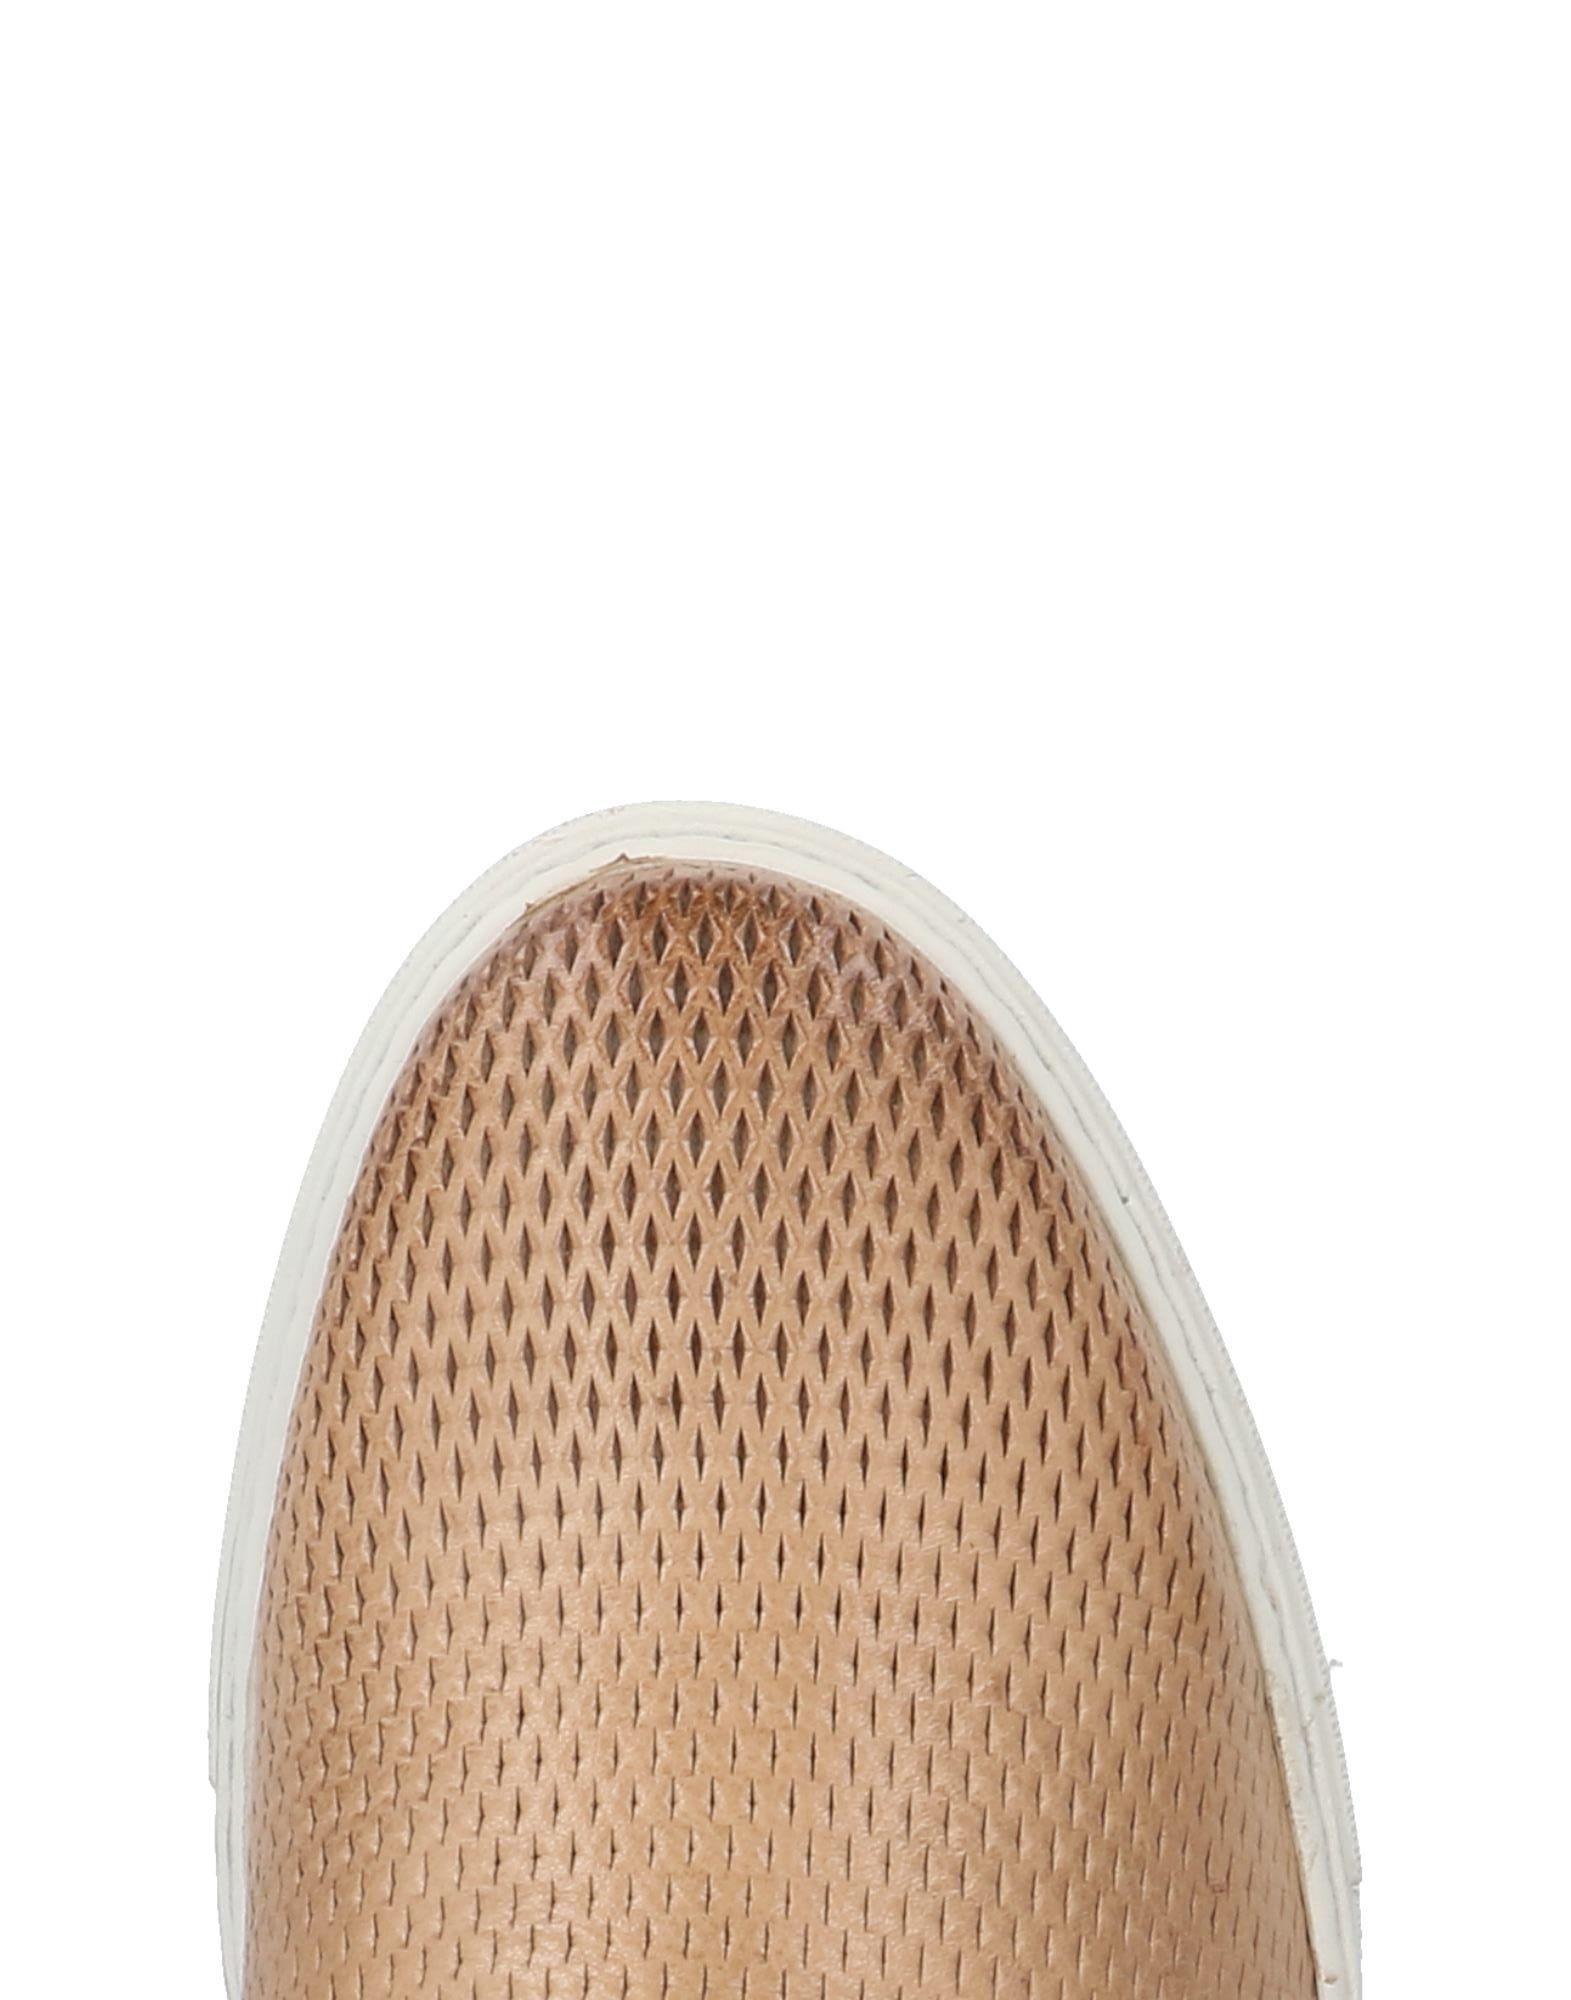 Moda Sneakers Sneakers Moda Brecos Uomo - 11498776LR 175215